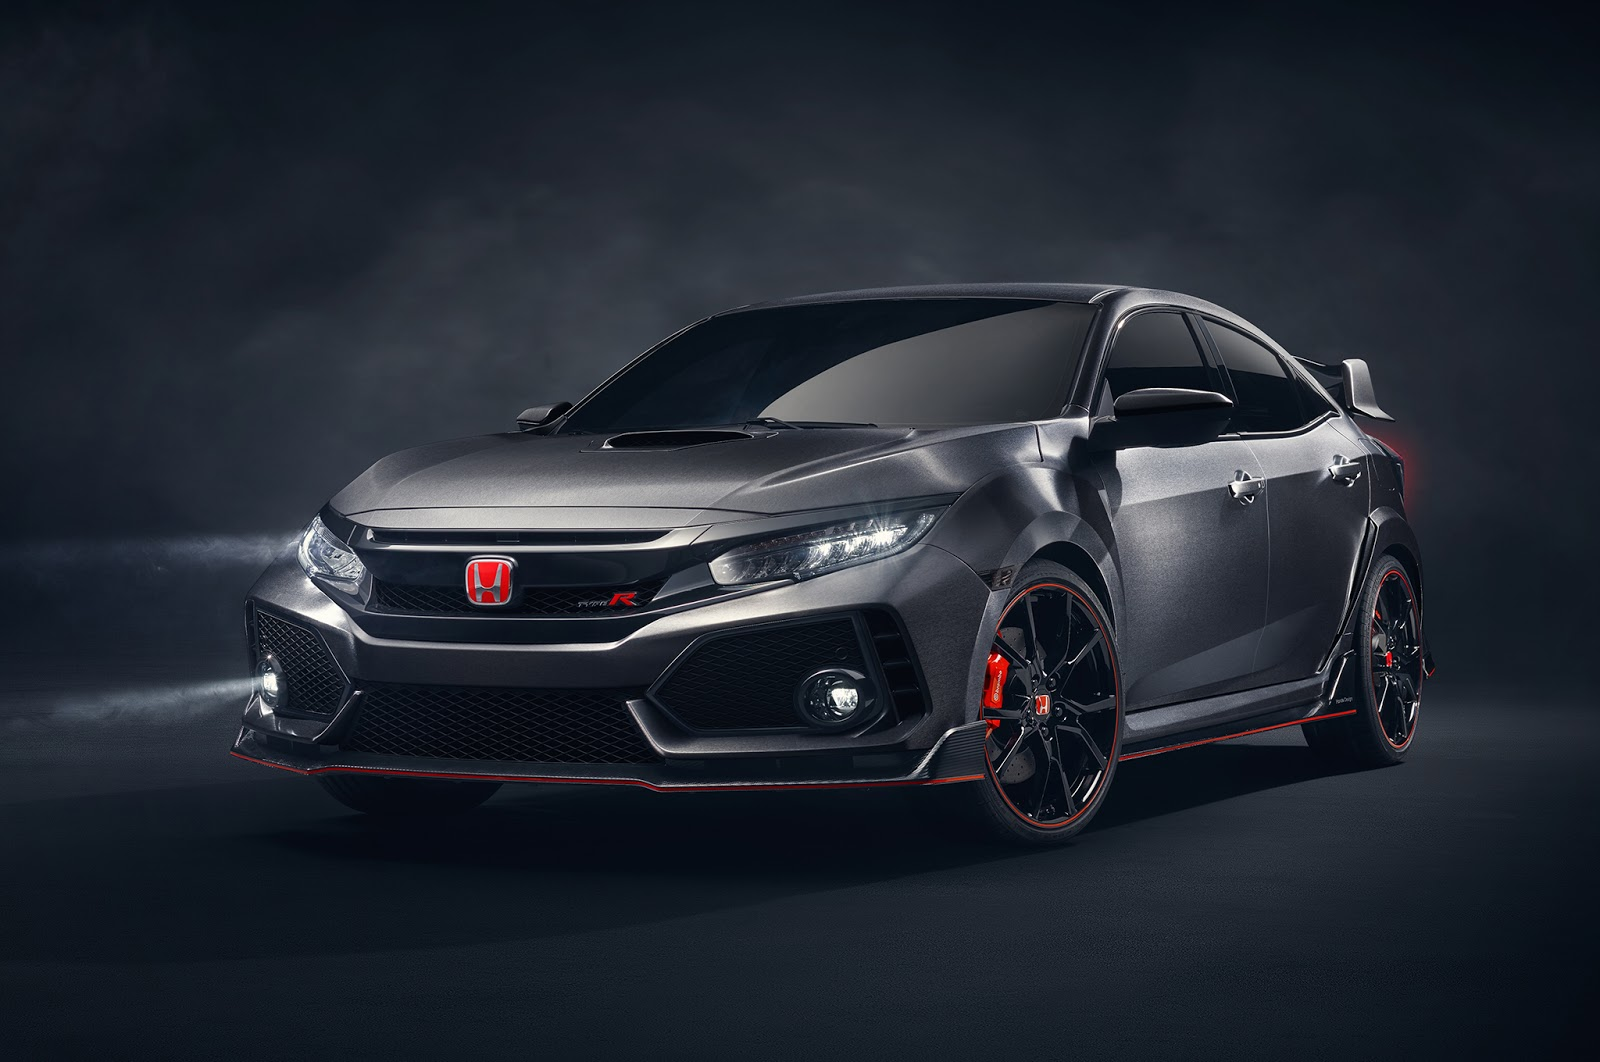 Хонда презентовала новый Civic Type R